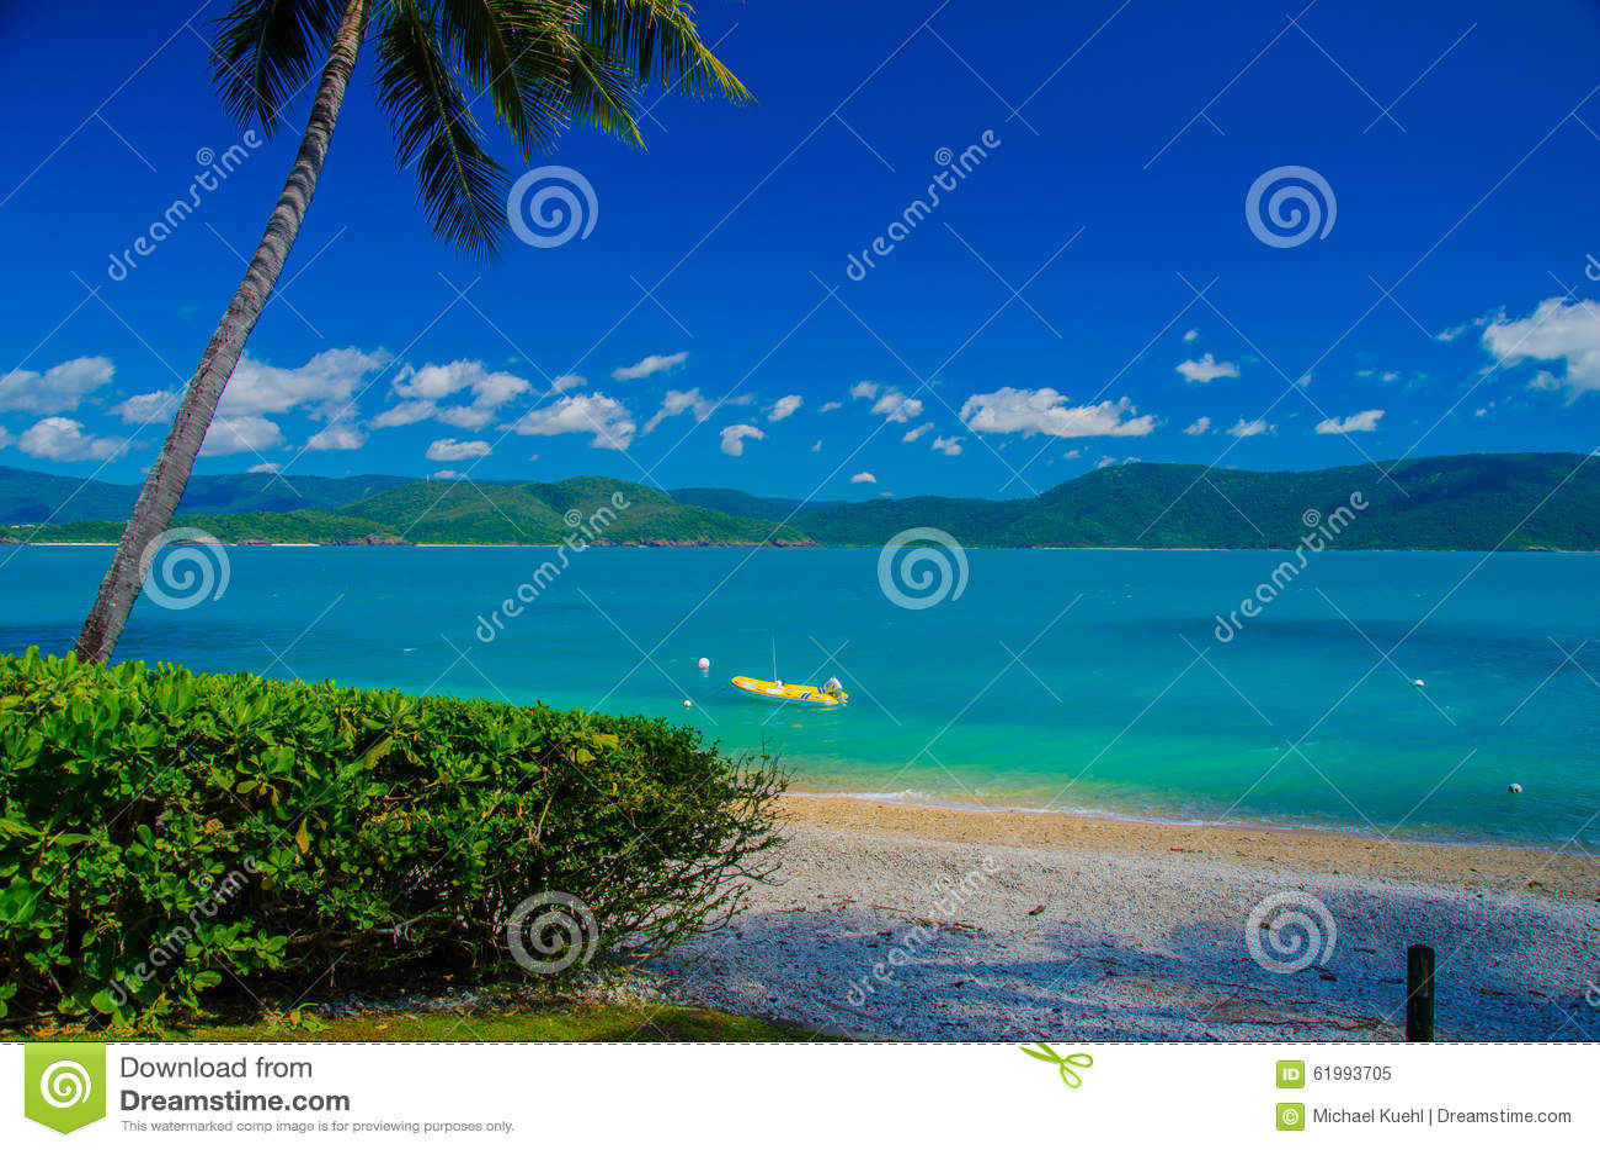 Beach on Daydream Island, Whitsunday Islands